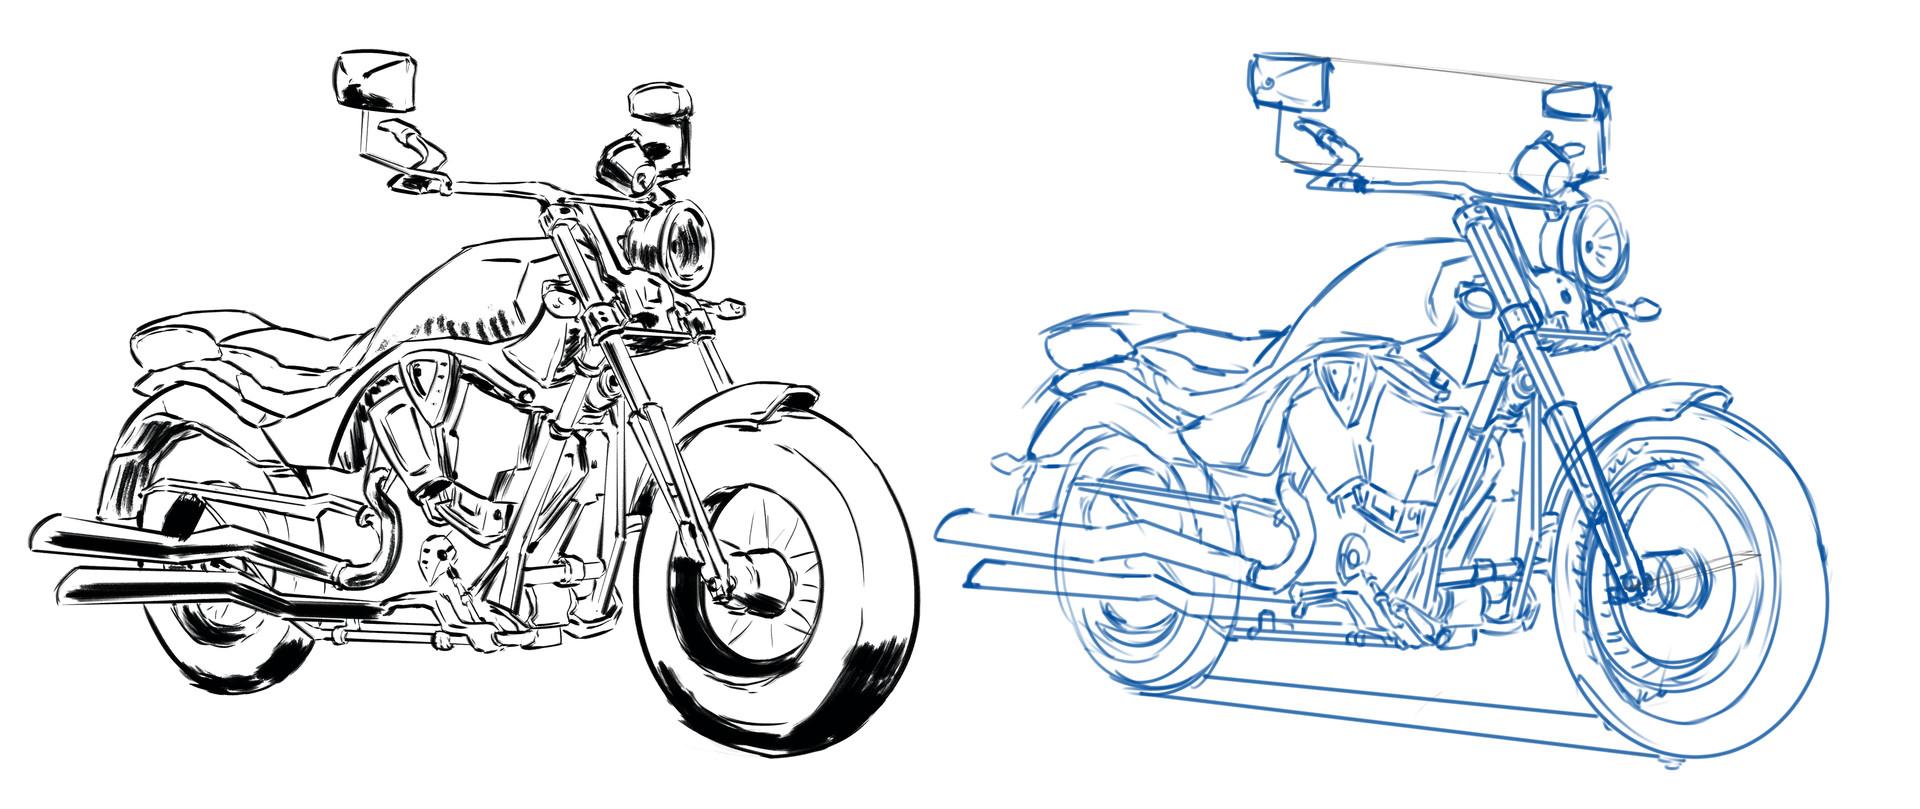 Sandra grunberg motorcycle